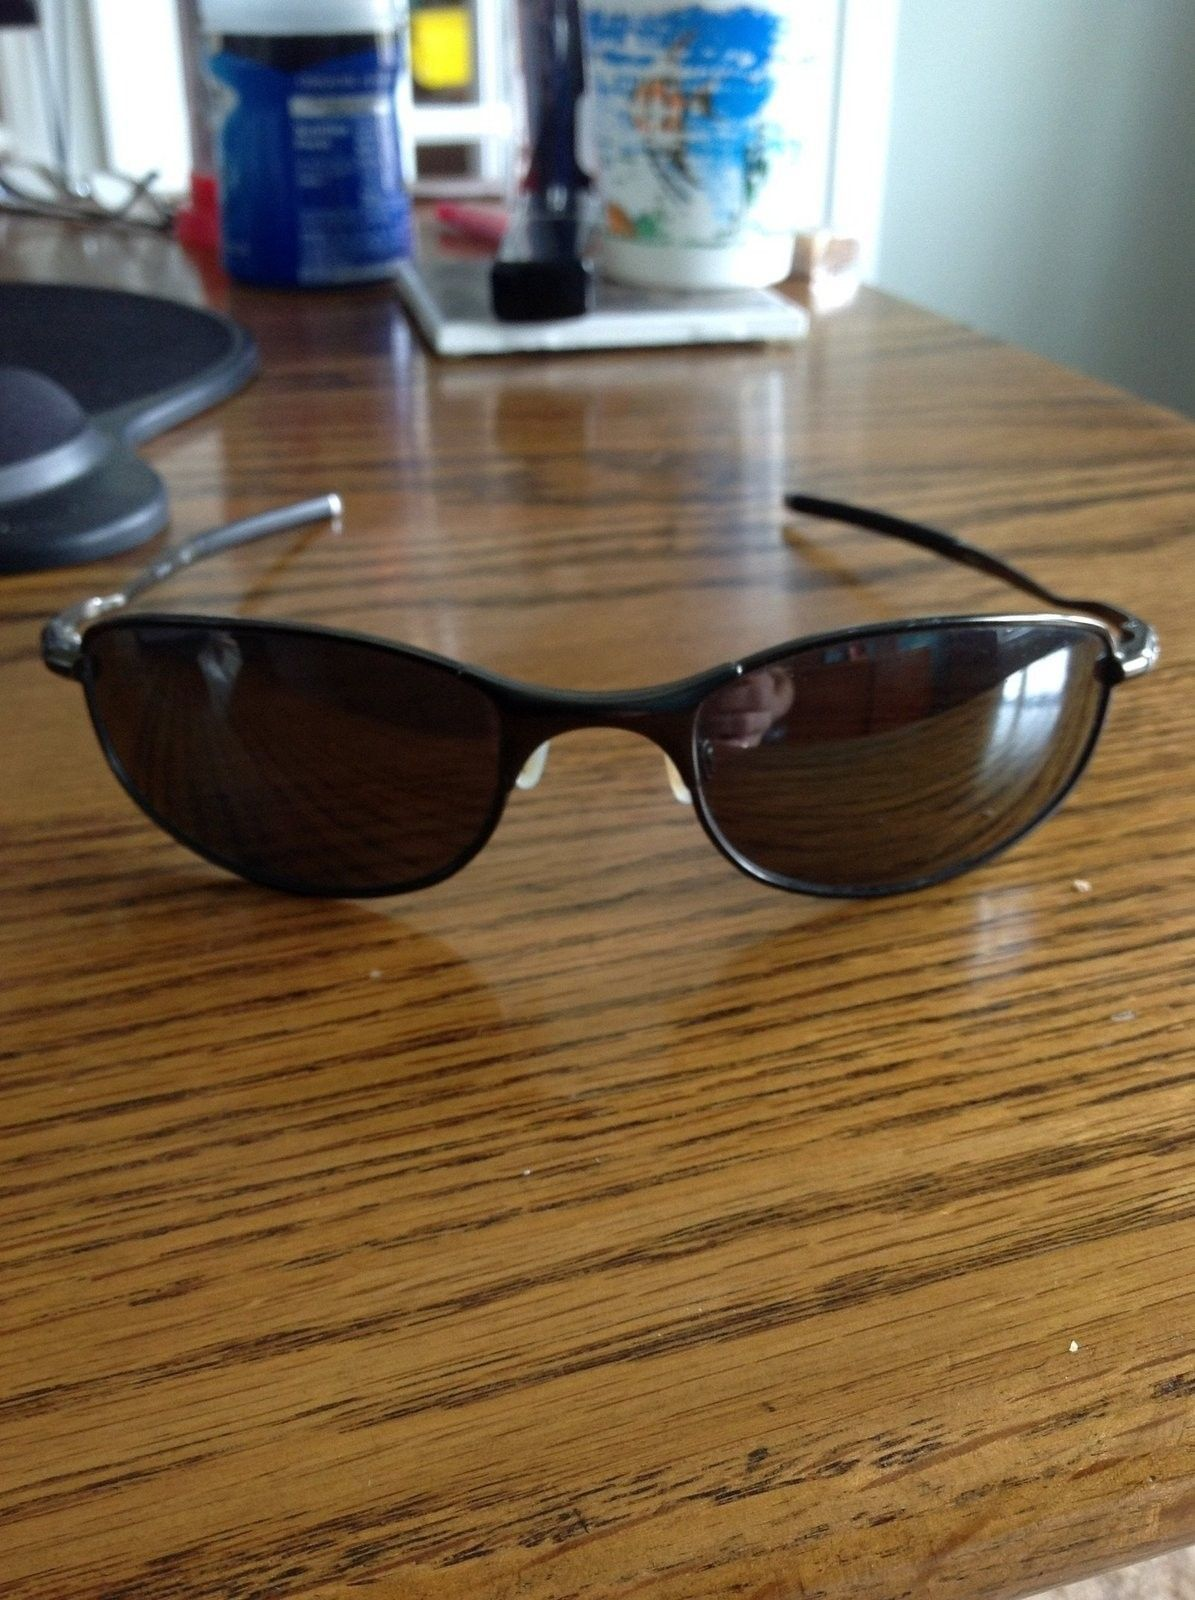 Need help identifying model of oakley sunglasses - image.jpg